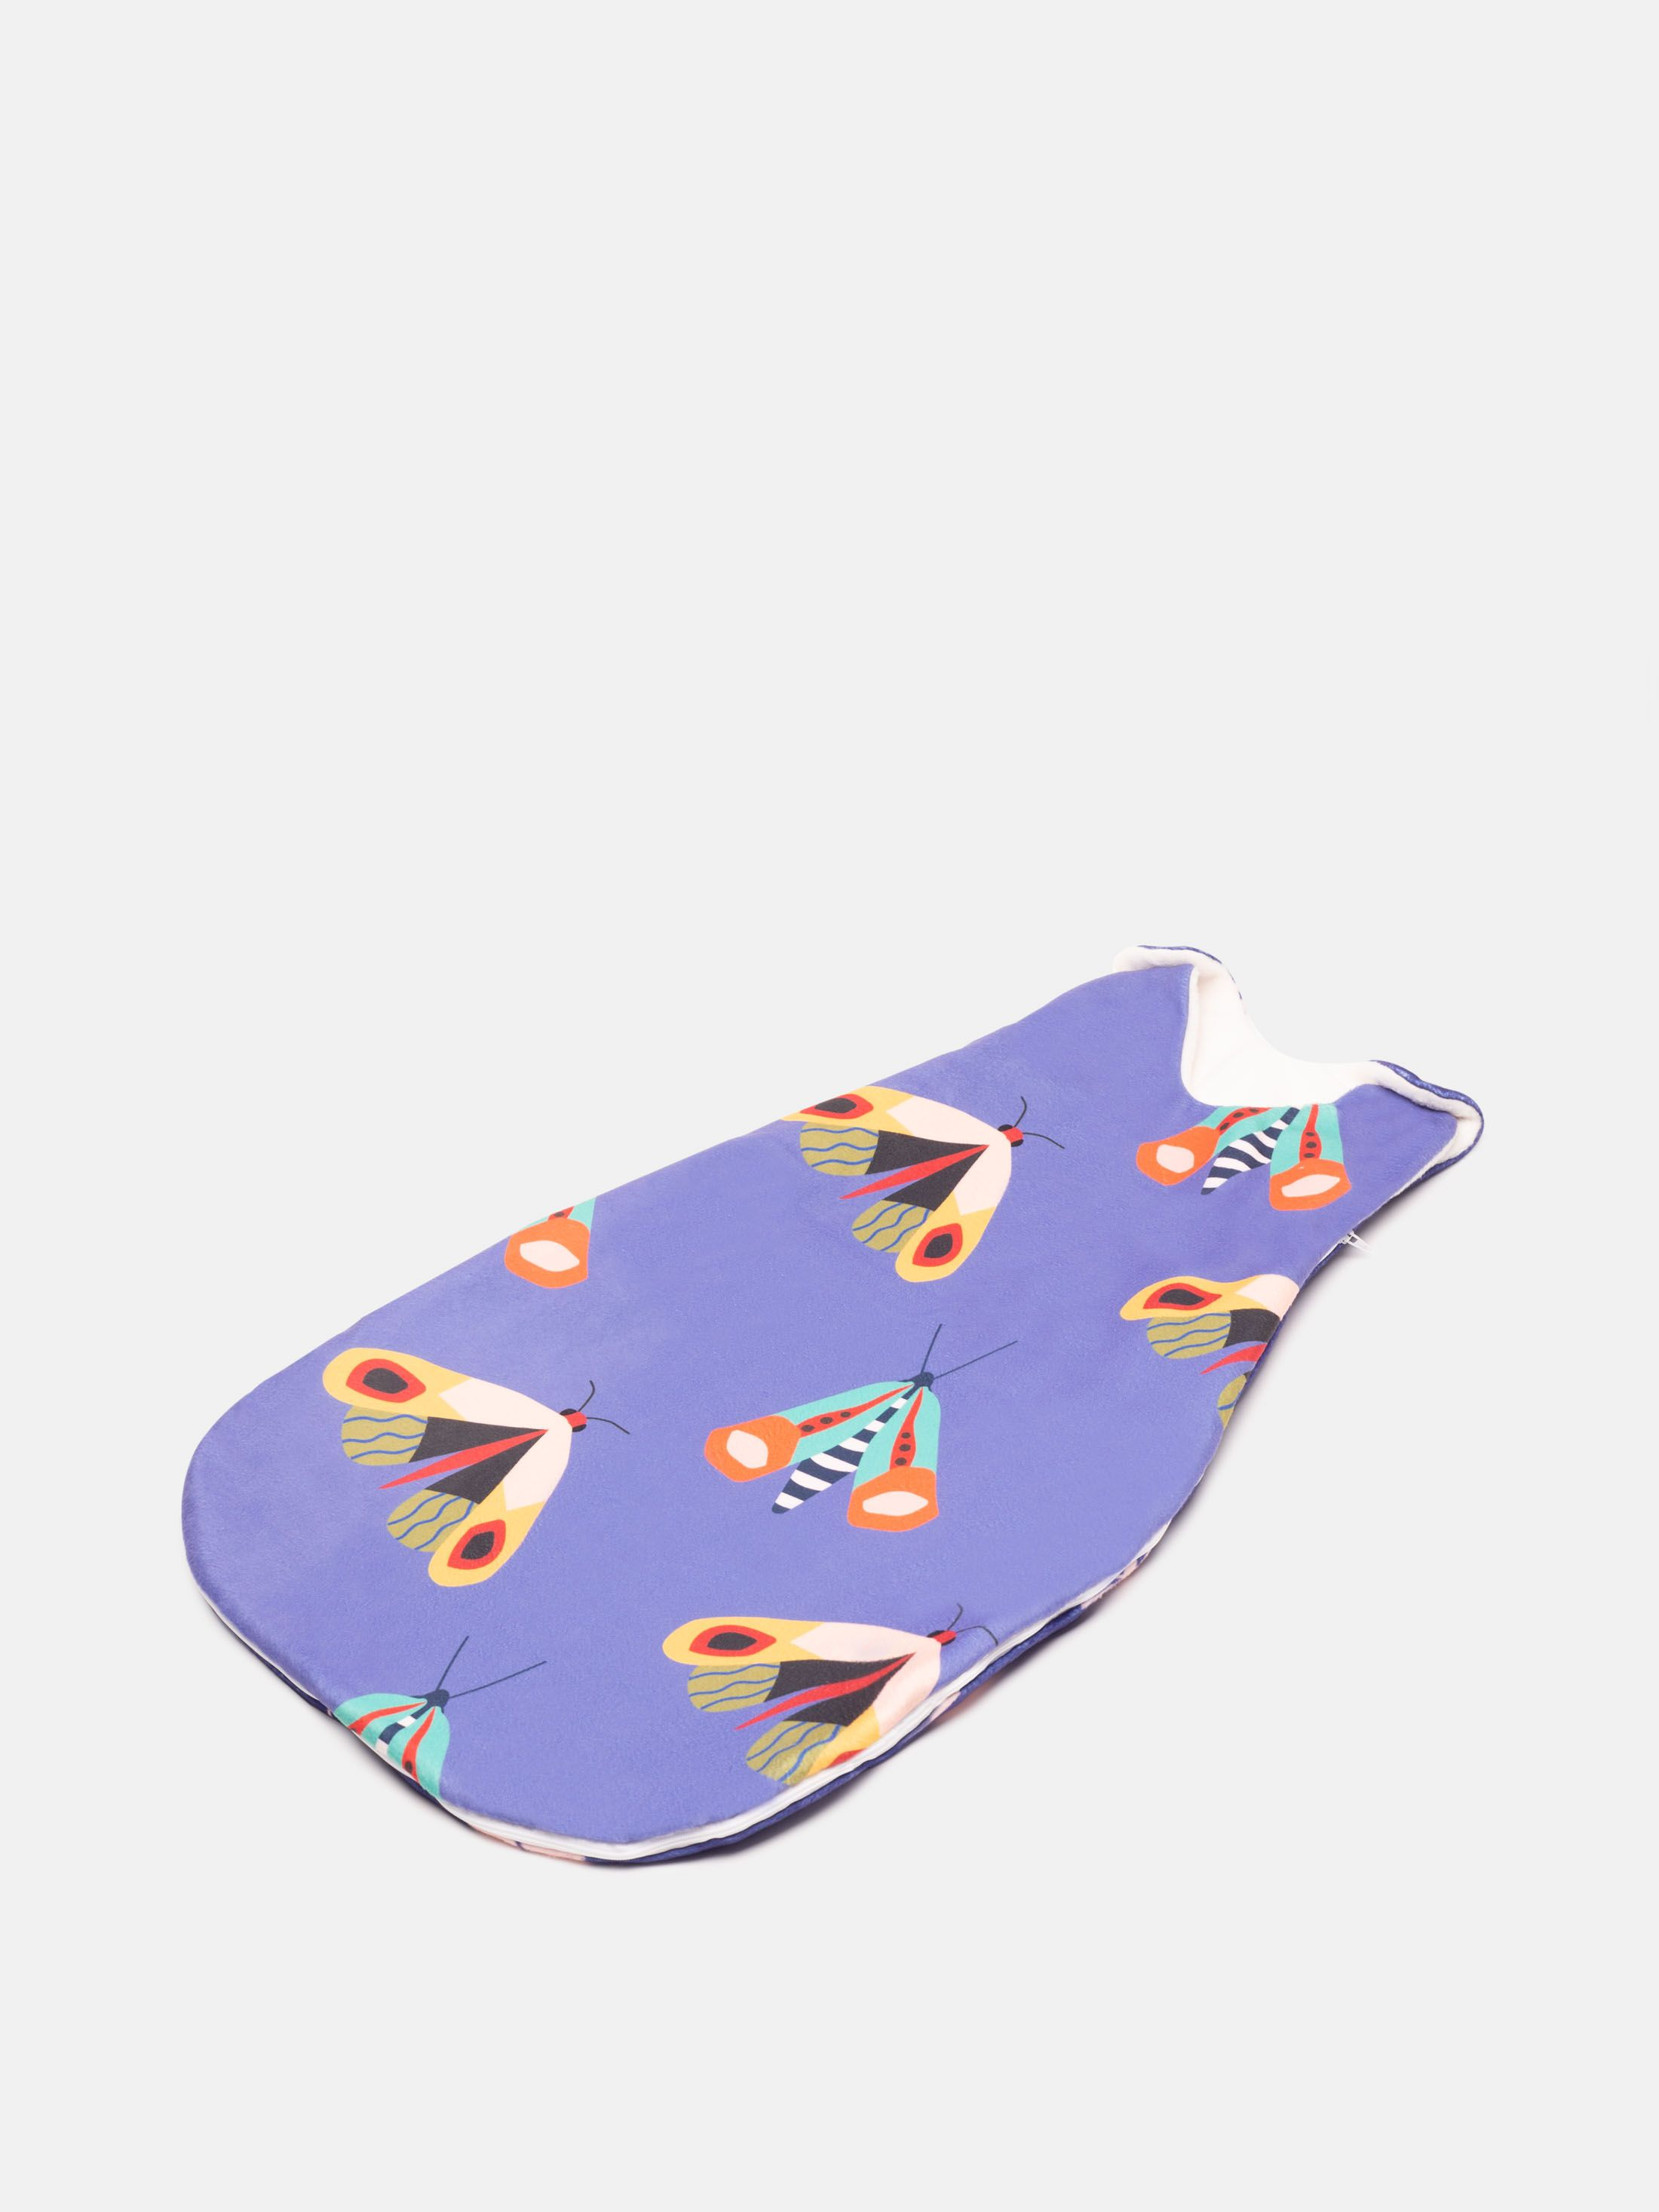 baby sleeping bags made and printed